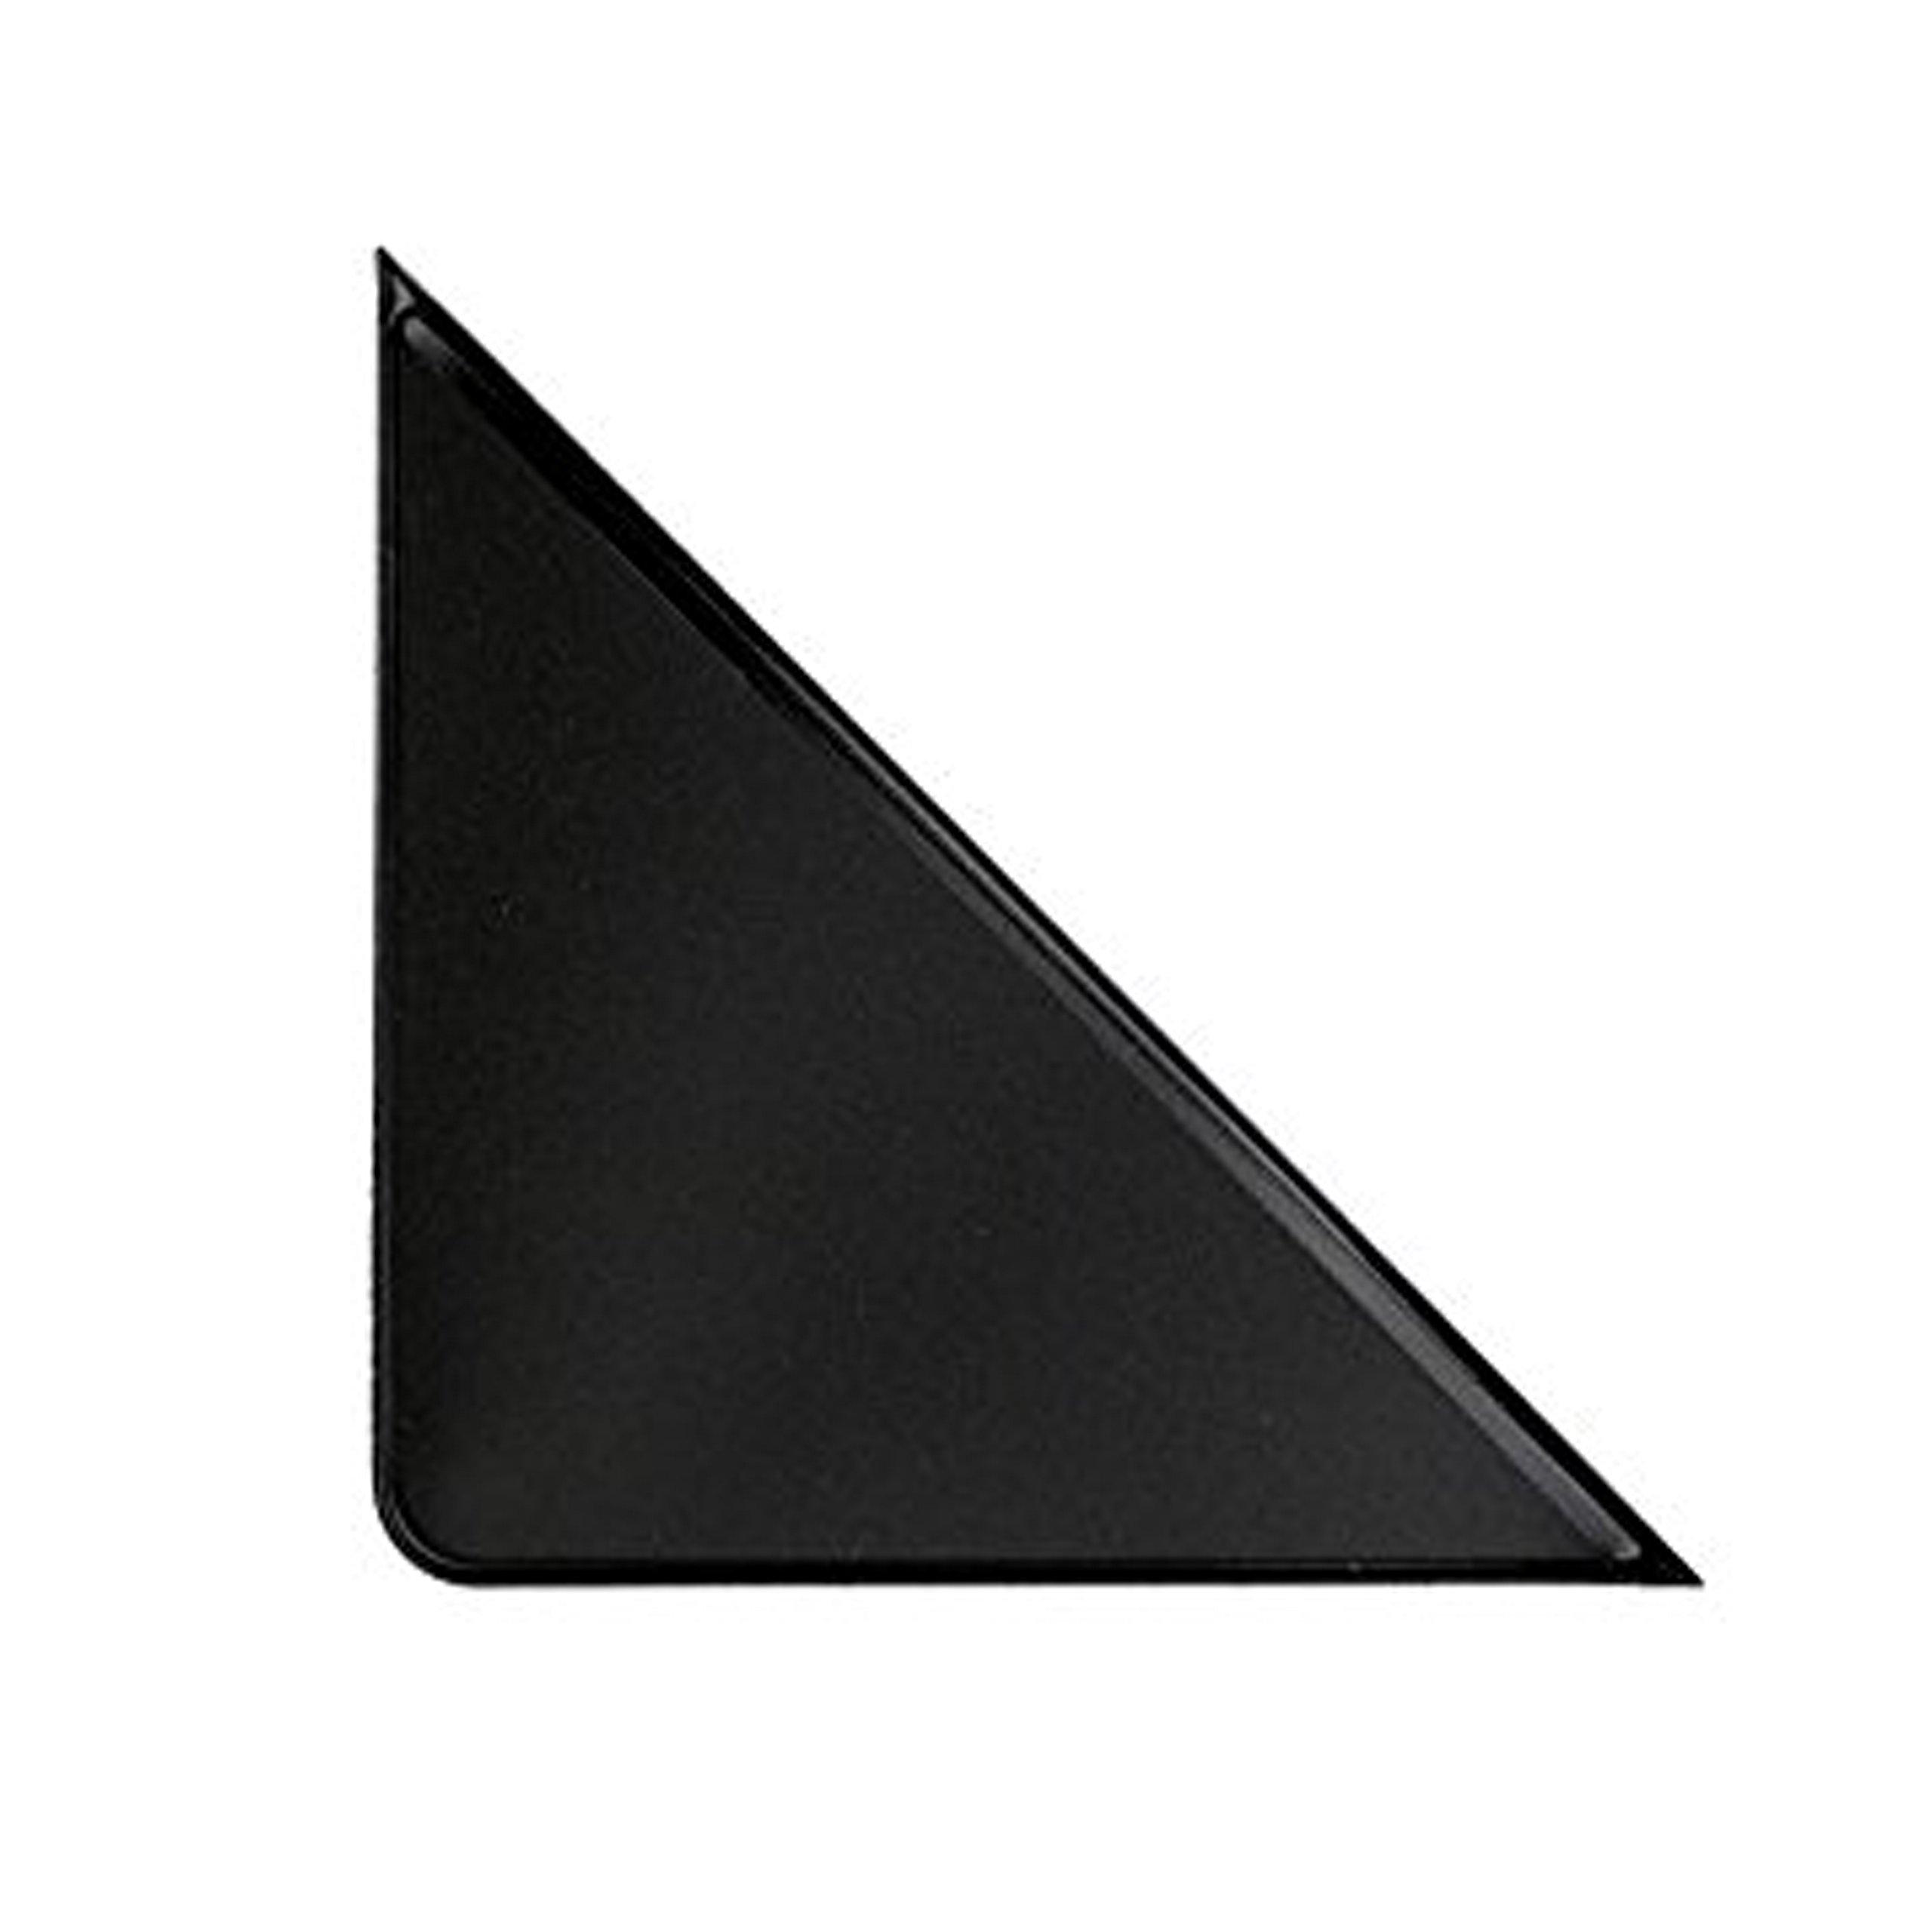 PackZen Durable Black Vinyl Adhesive Calendar Corner Protector - Case of 1600 - Made in the USA